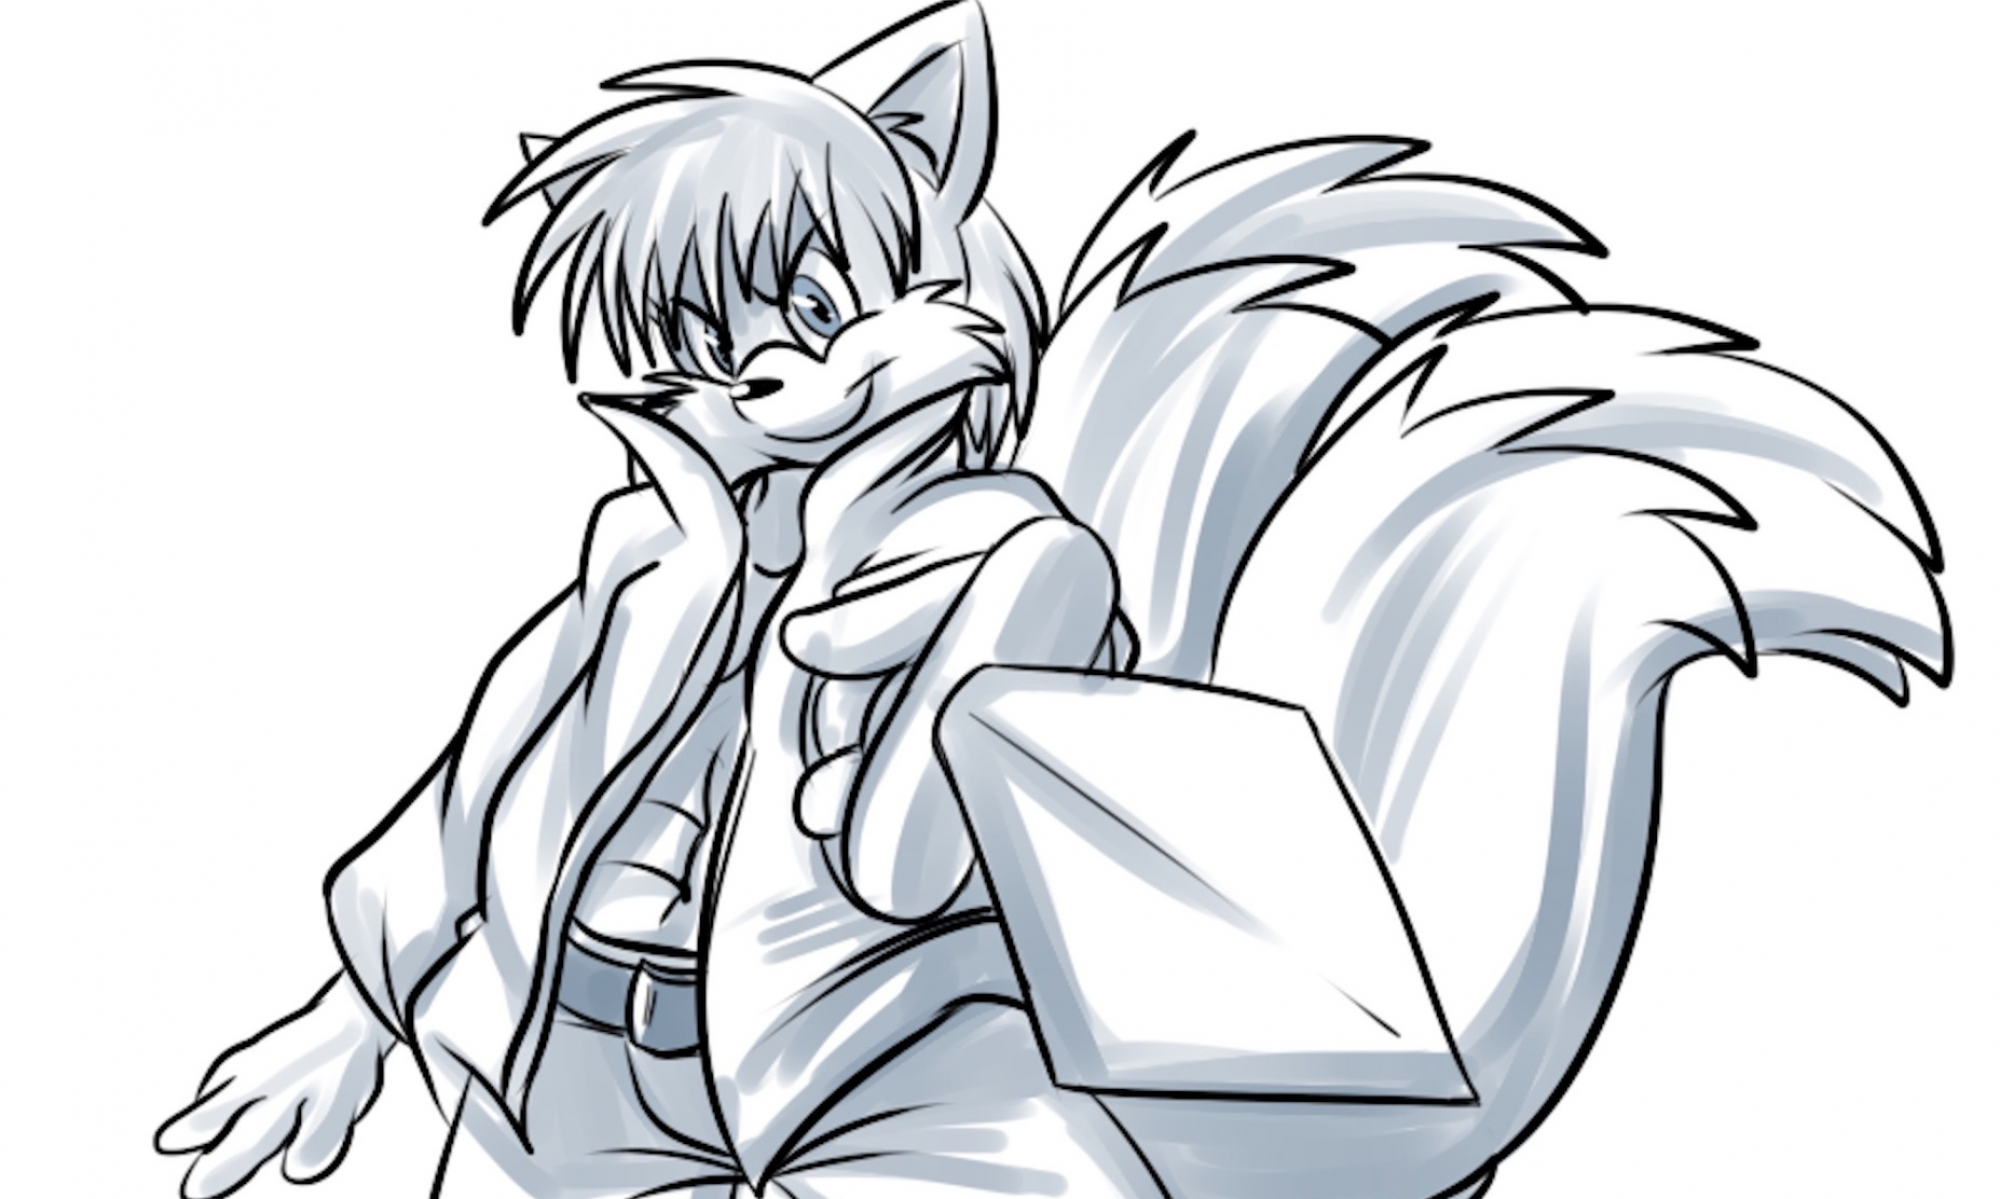 Erratic Foxboy